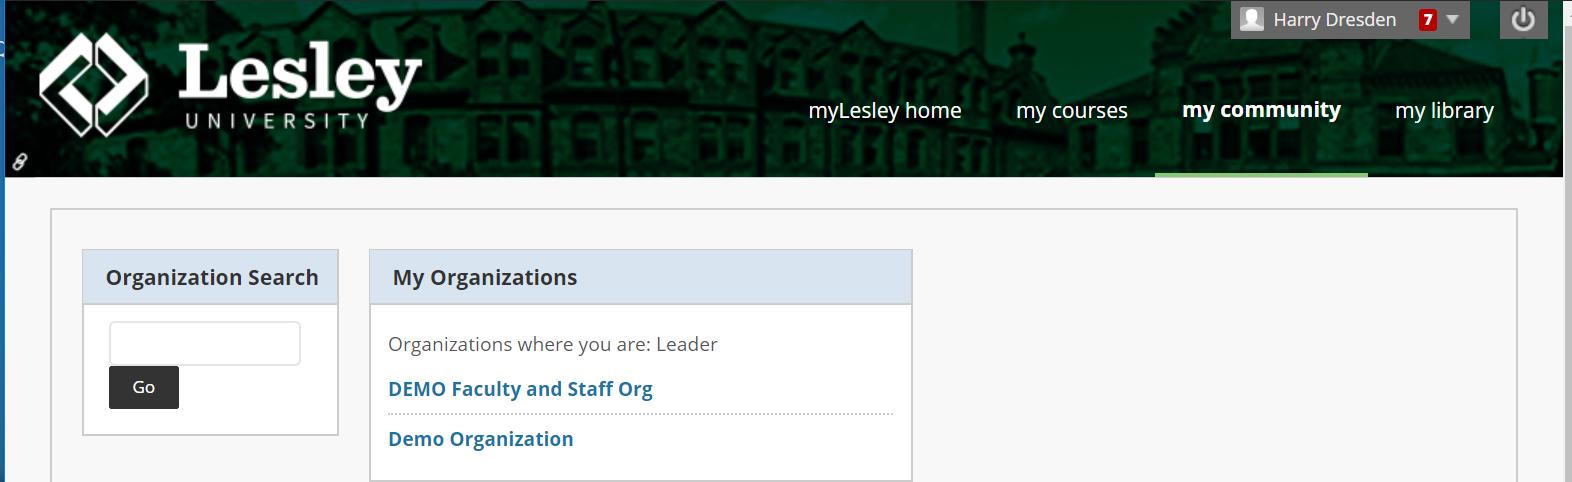 screenshot of myLesley community tab